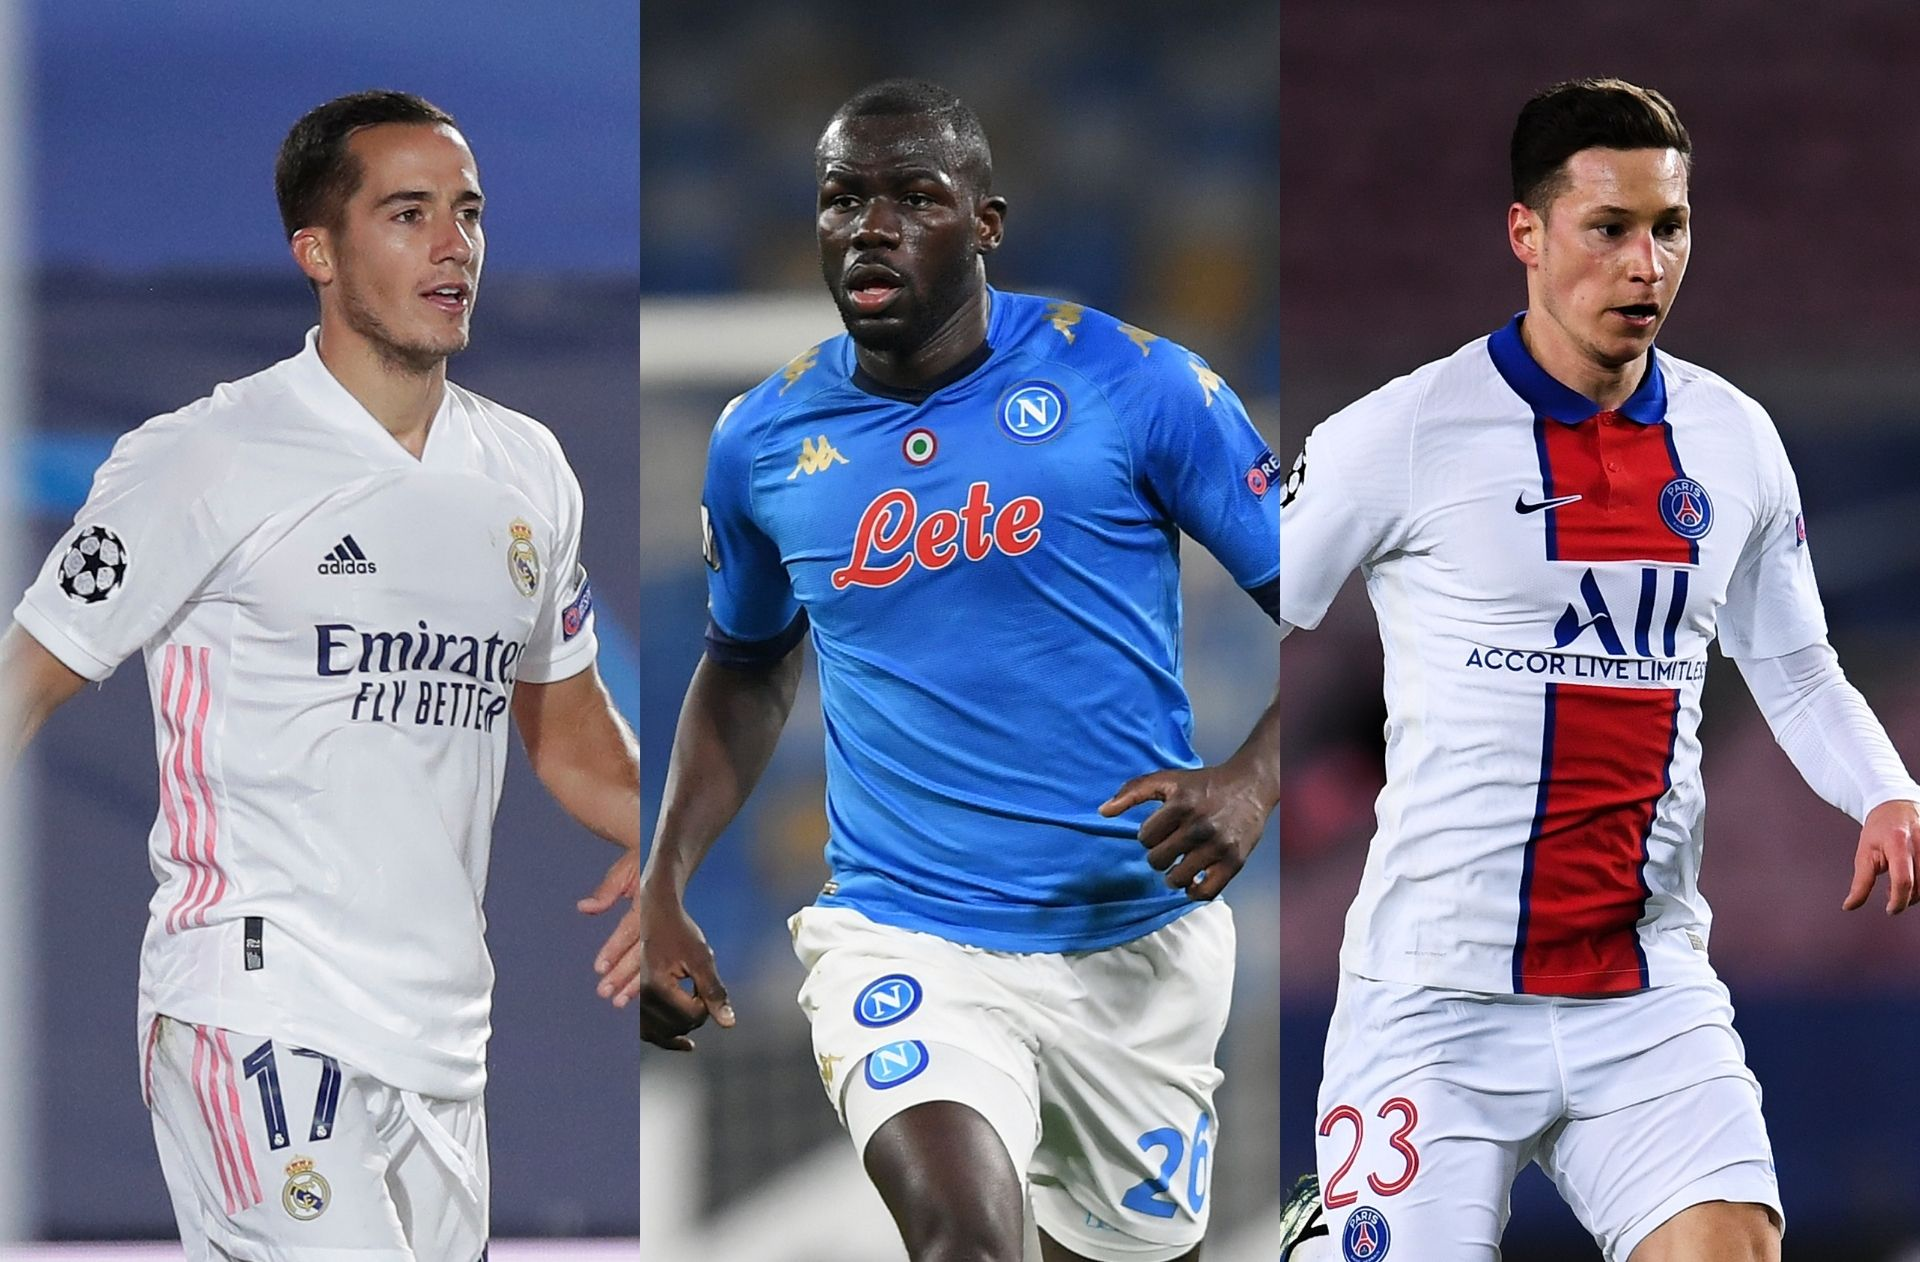 Lucas Vazquez of Real Madrid, Kalidou Koulibaly of Napoli, Julian Draxler of Paris Saint-Germain